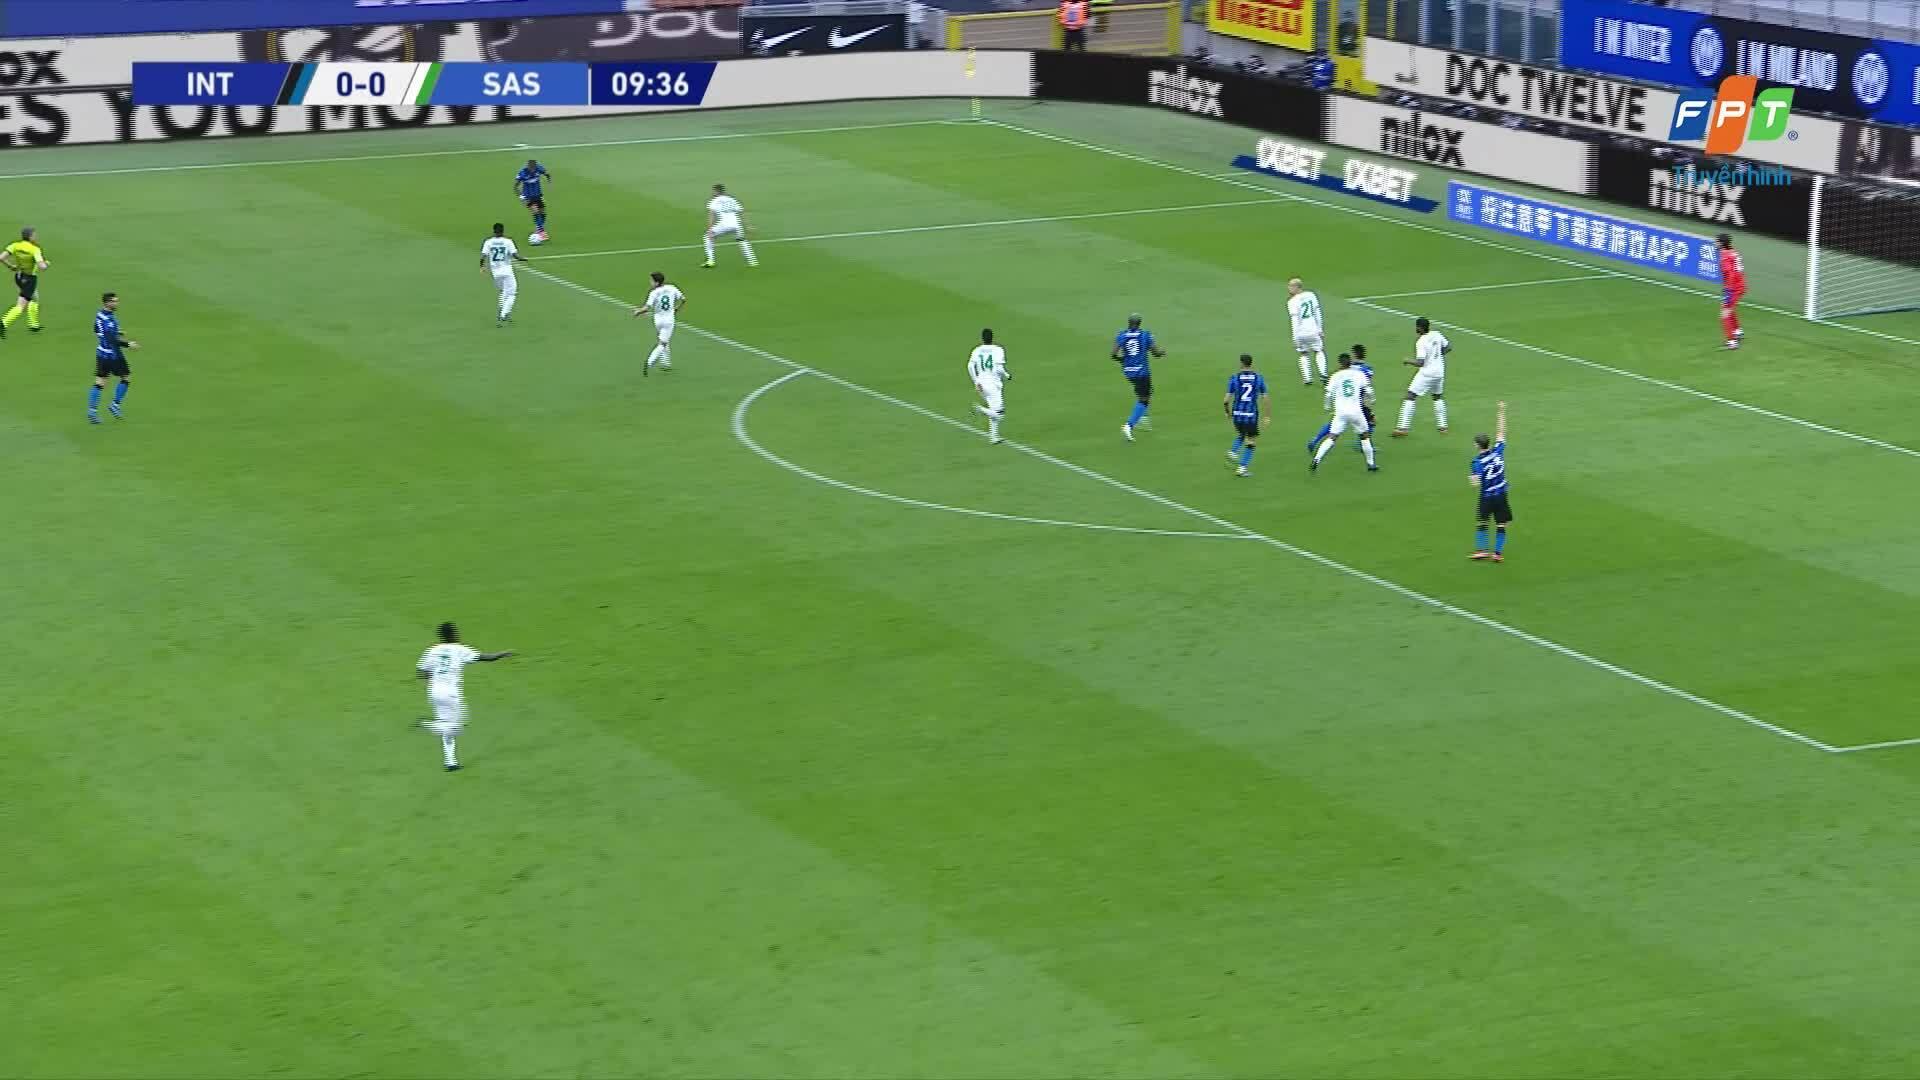 Inter 2-1 Sassuolo